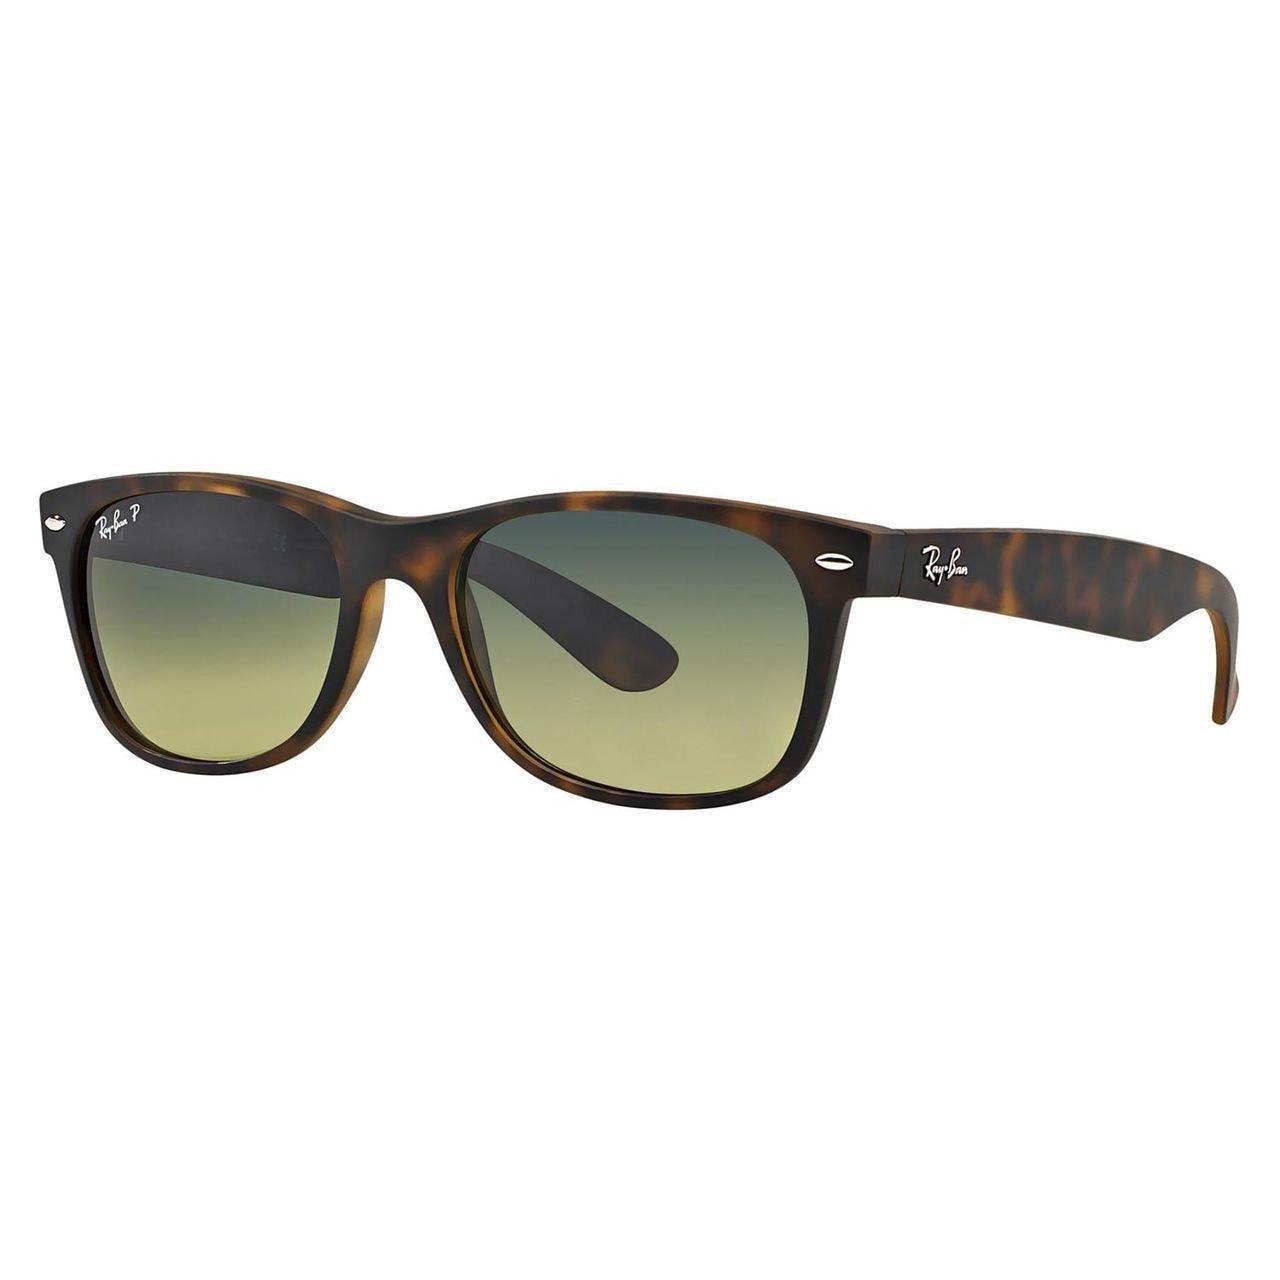 f47301ccd8ab Ray-Ban RB2132 894/76 New Wayfarer Tortoise Frame Polarized Blue/Green  Gradient 52mm Lens Sunglasses